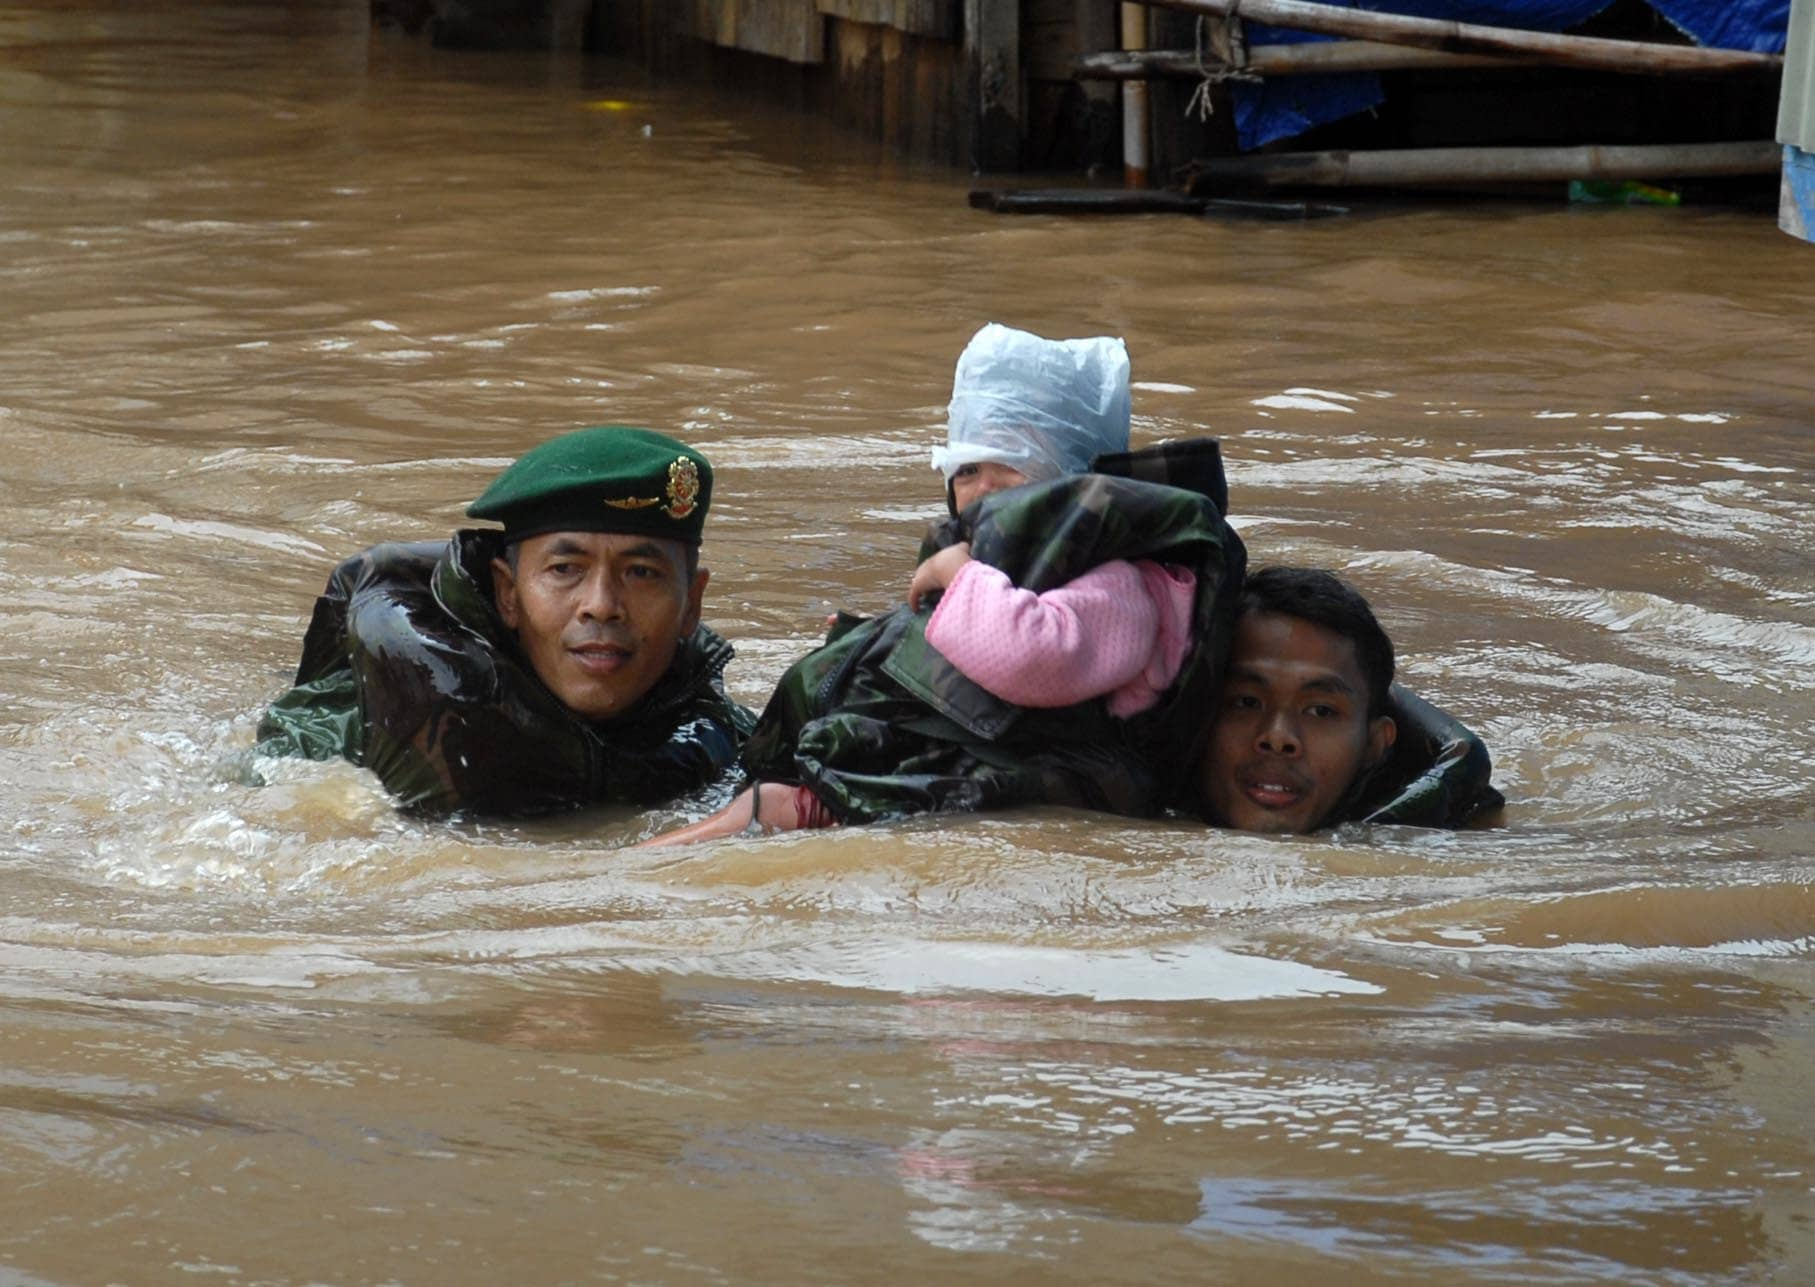 evakuasi korban banjir kampun pulo 19-1-14 (2)